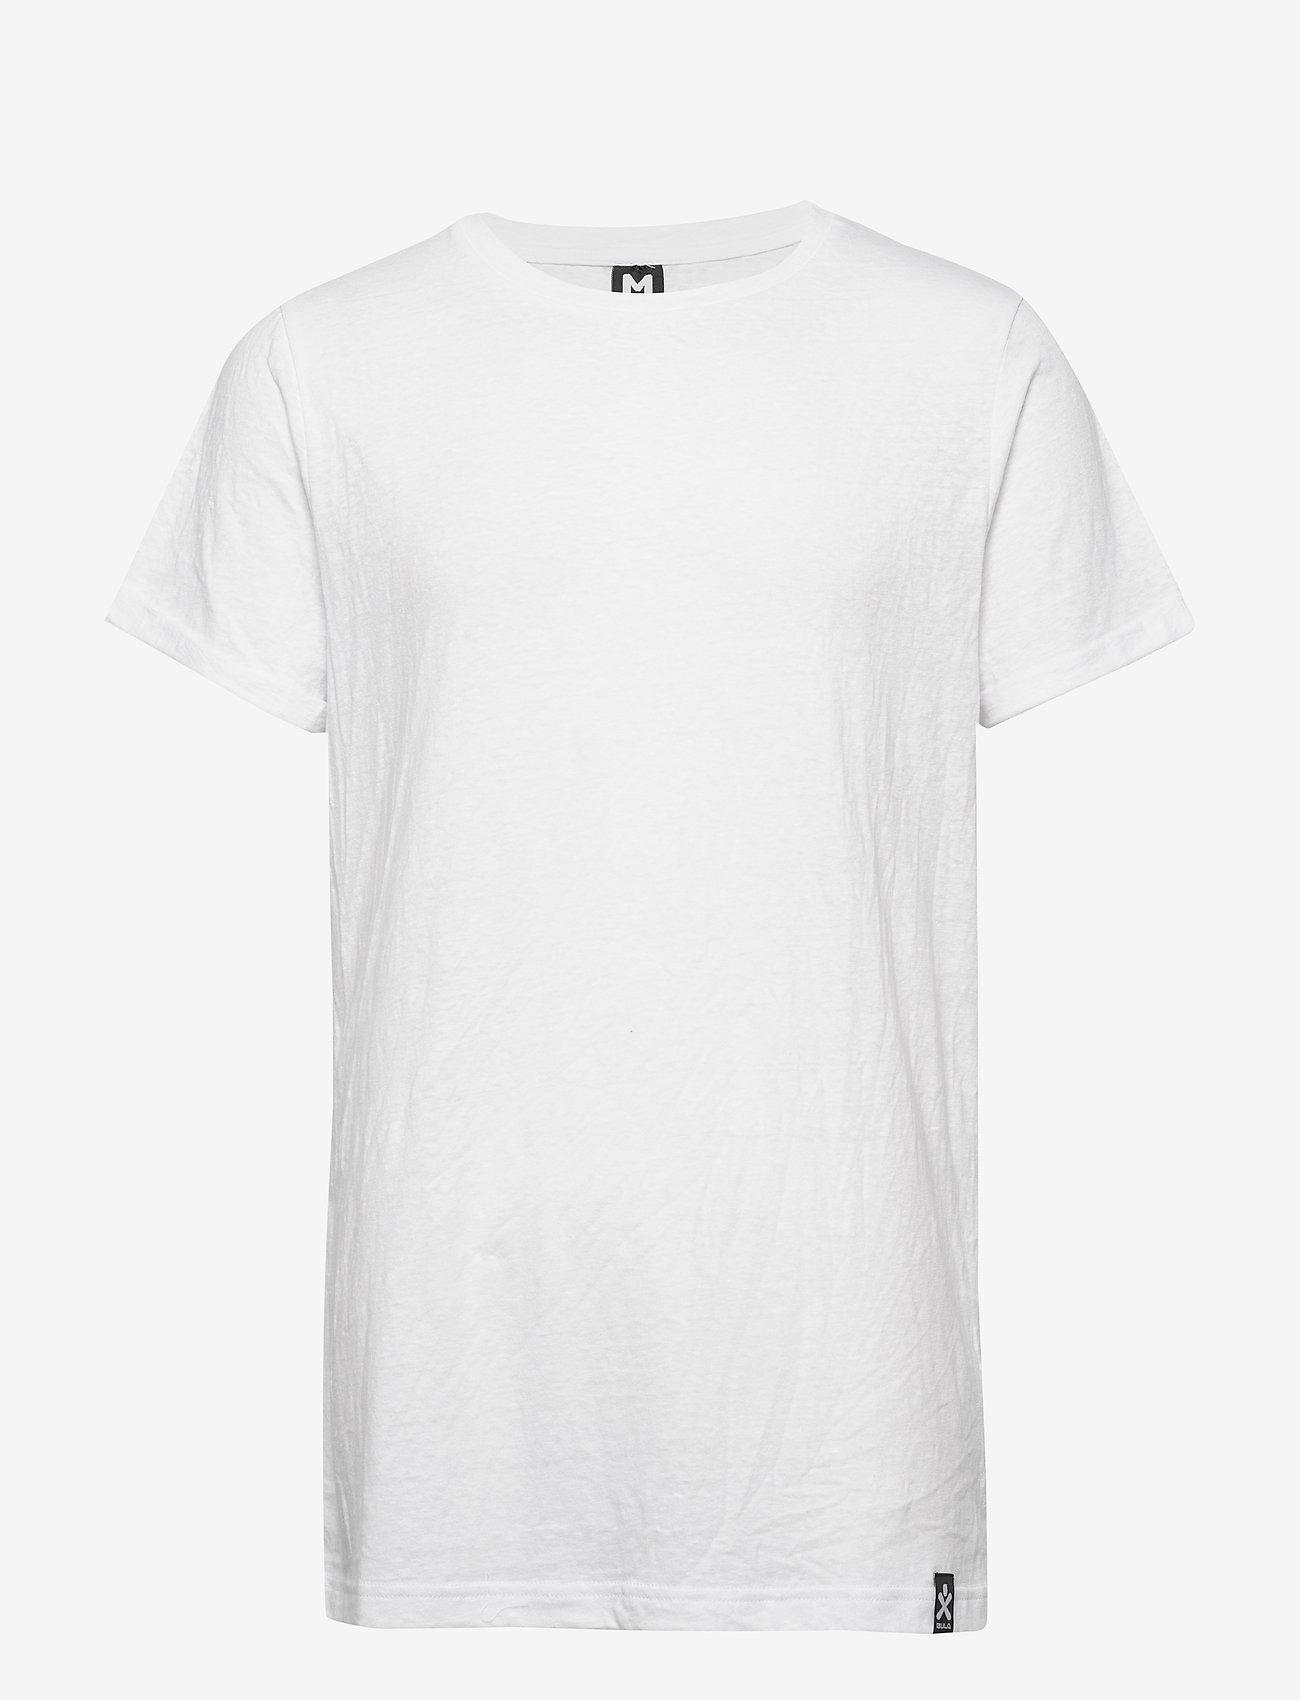 Bula - Foam Tee - oberteile & t-shirts - white - 0